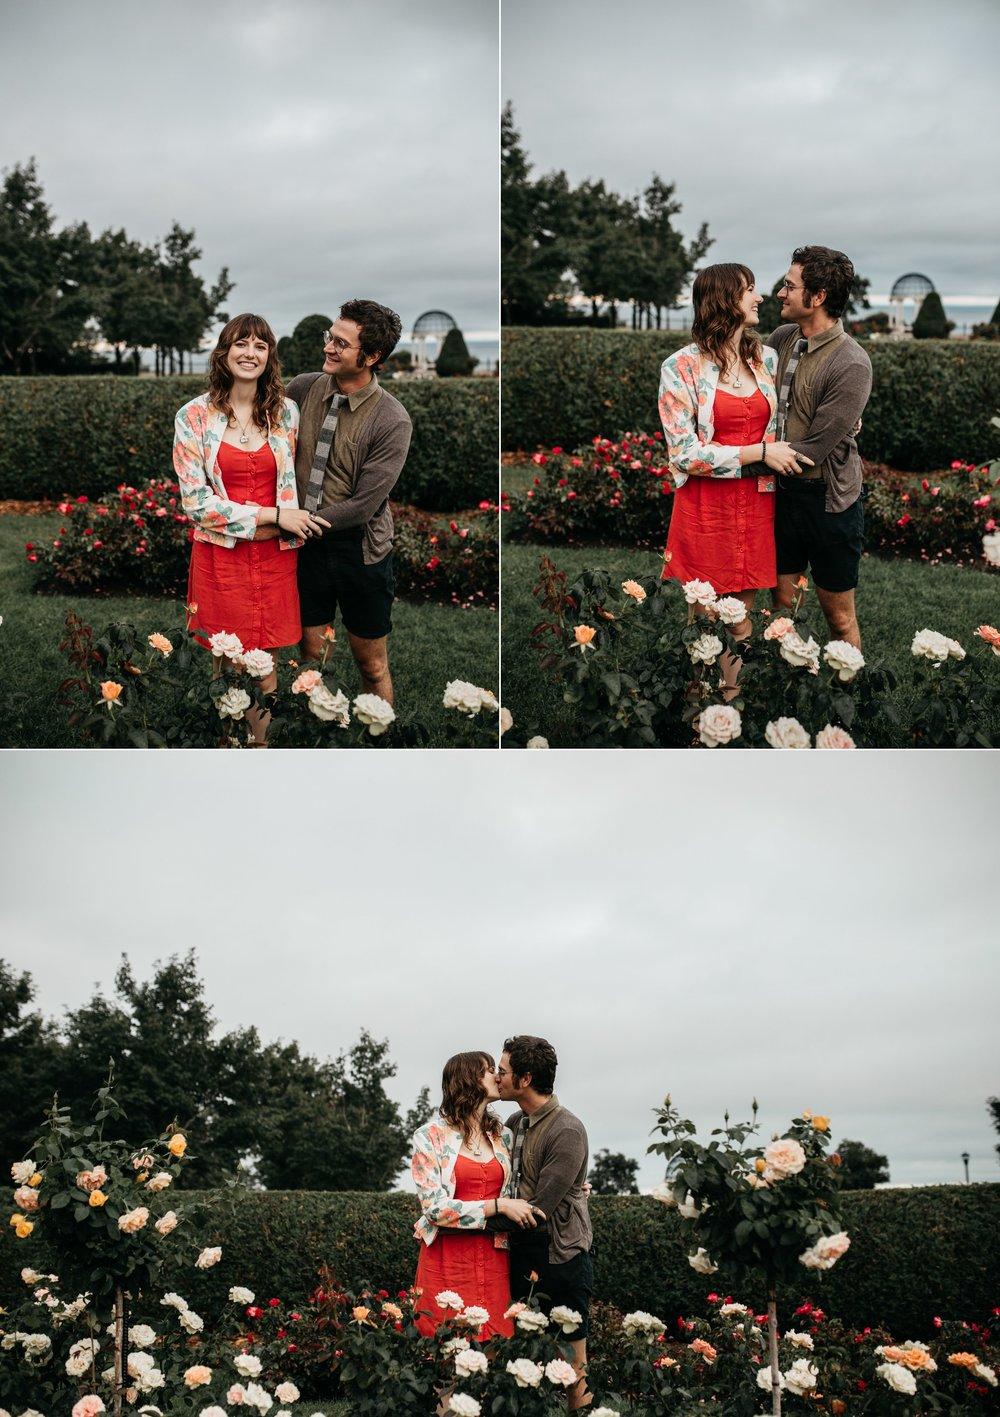 mandy aaron engagement minneapolis minnesota texas austin wedding elopement destination intimate best photographer_0149.jpg